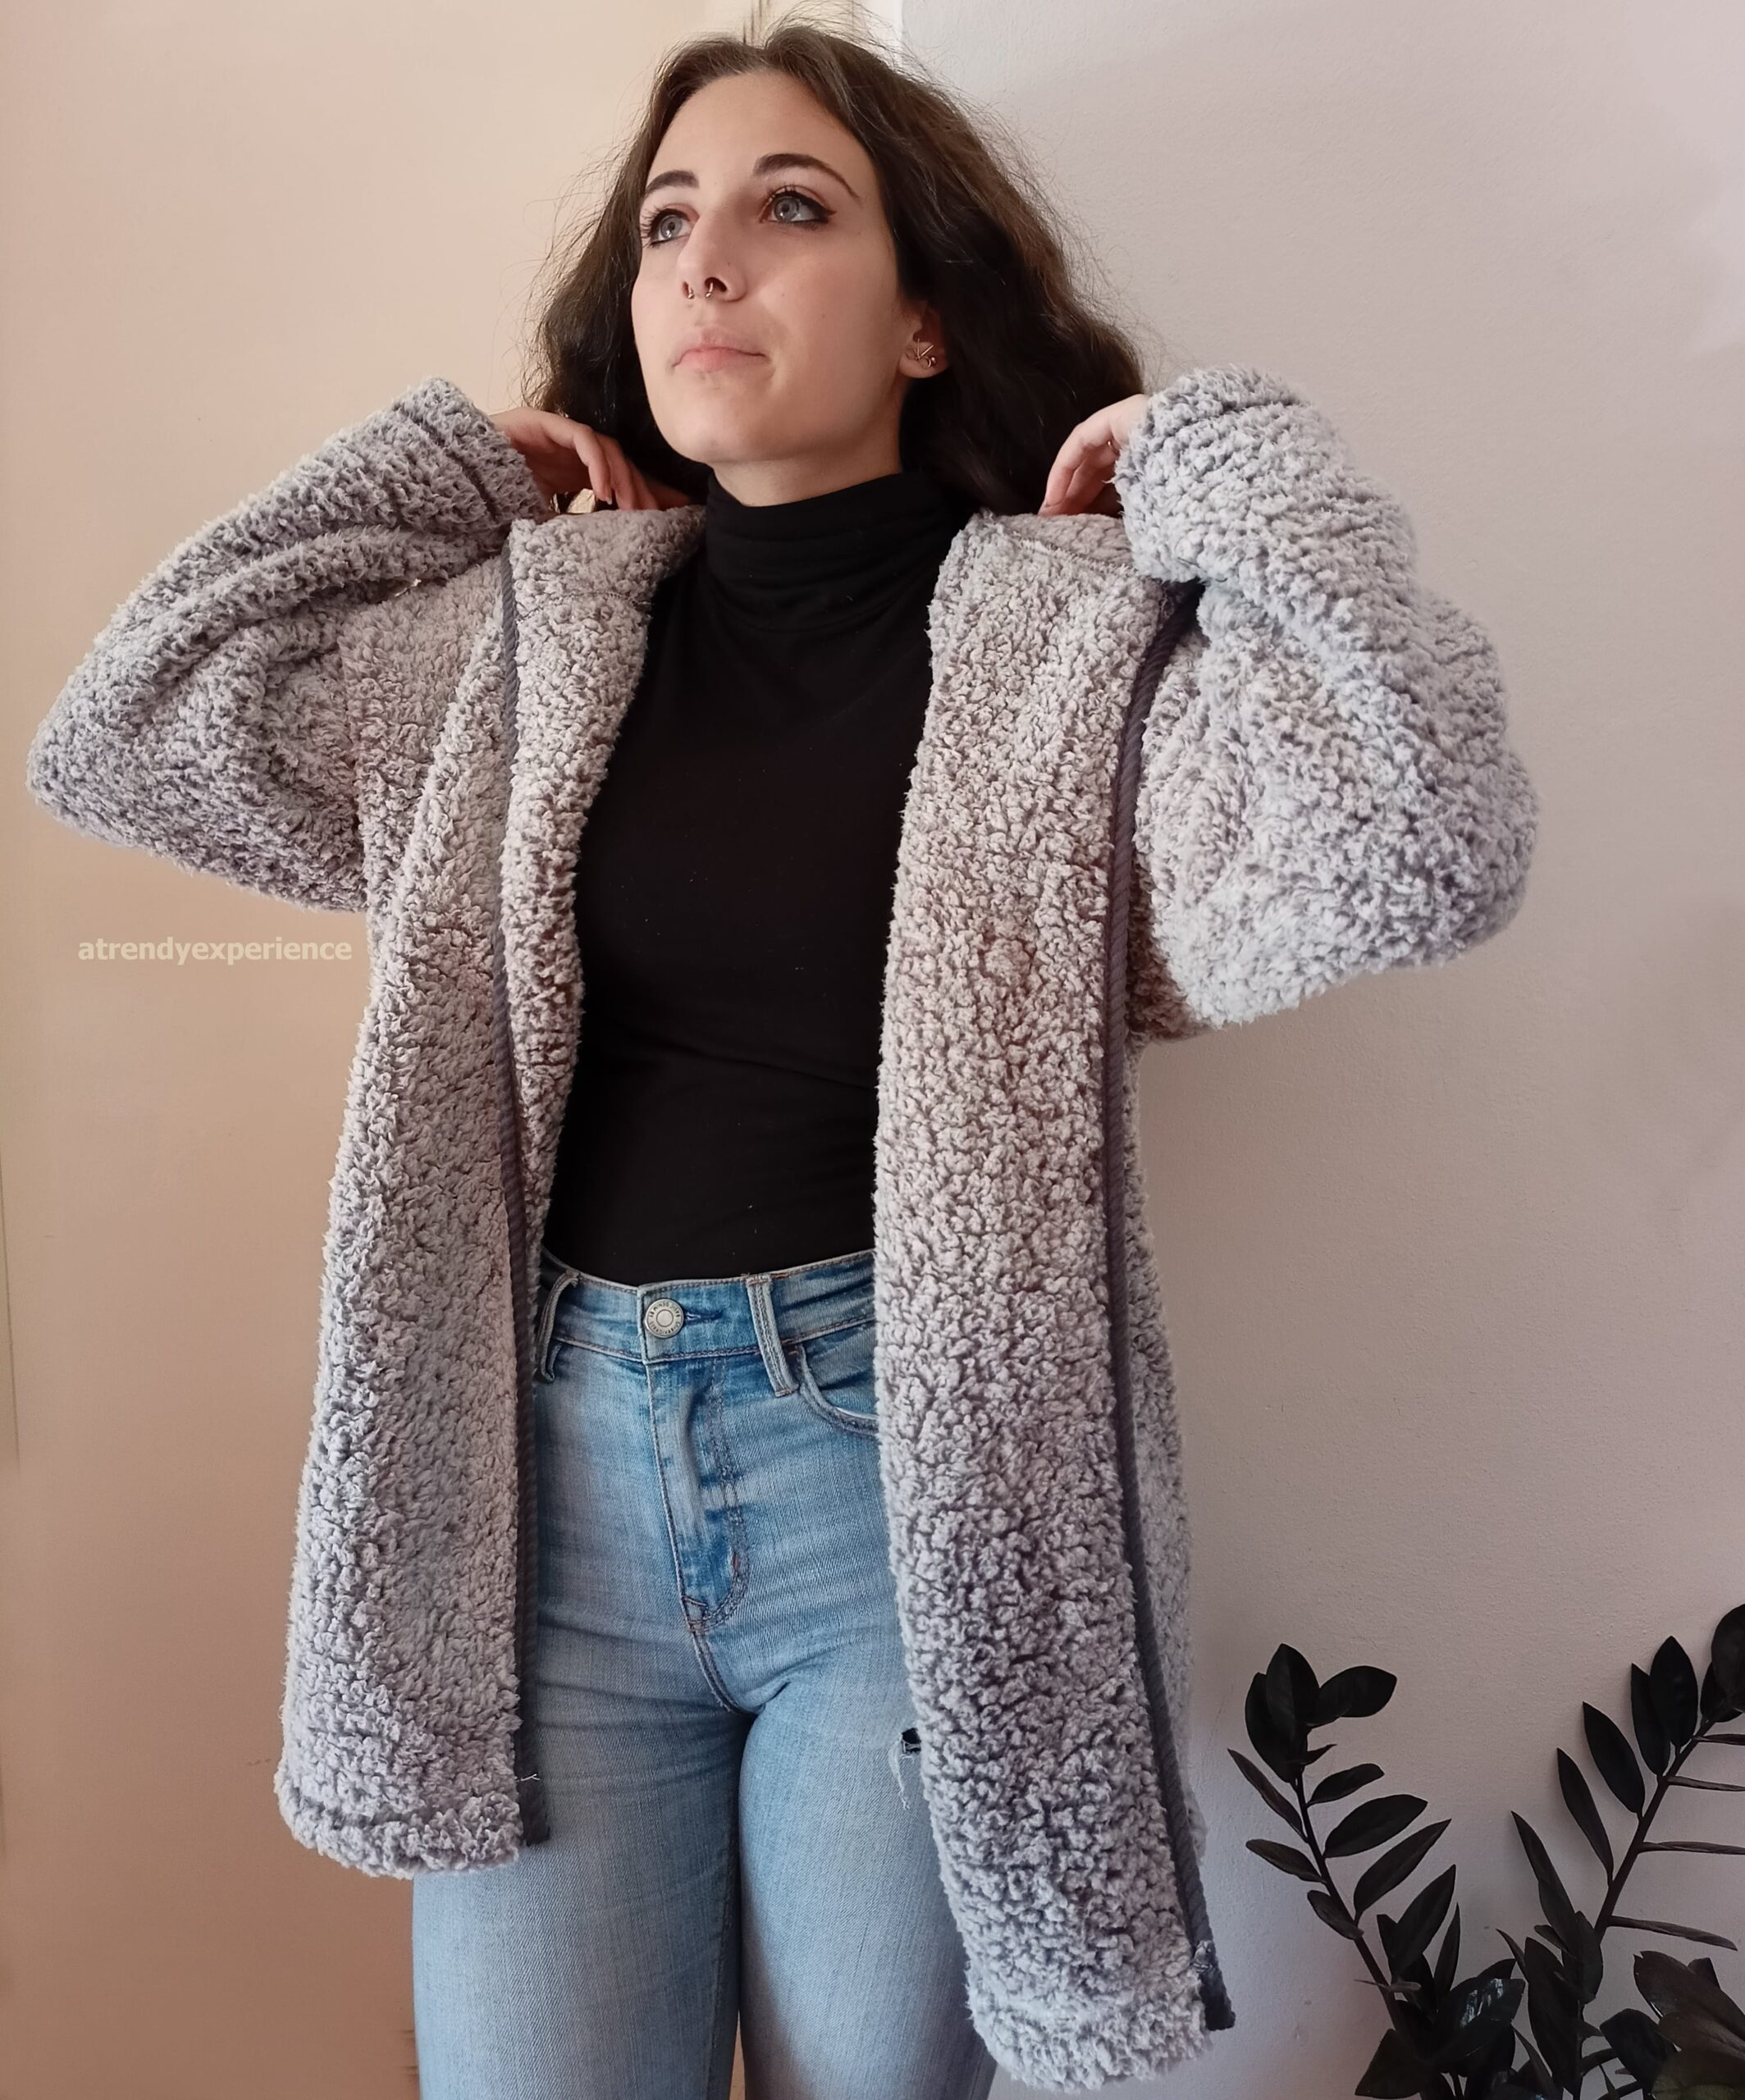 cappotto teddy coat